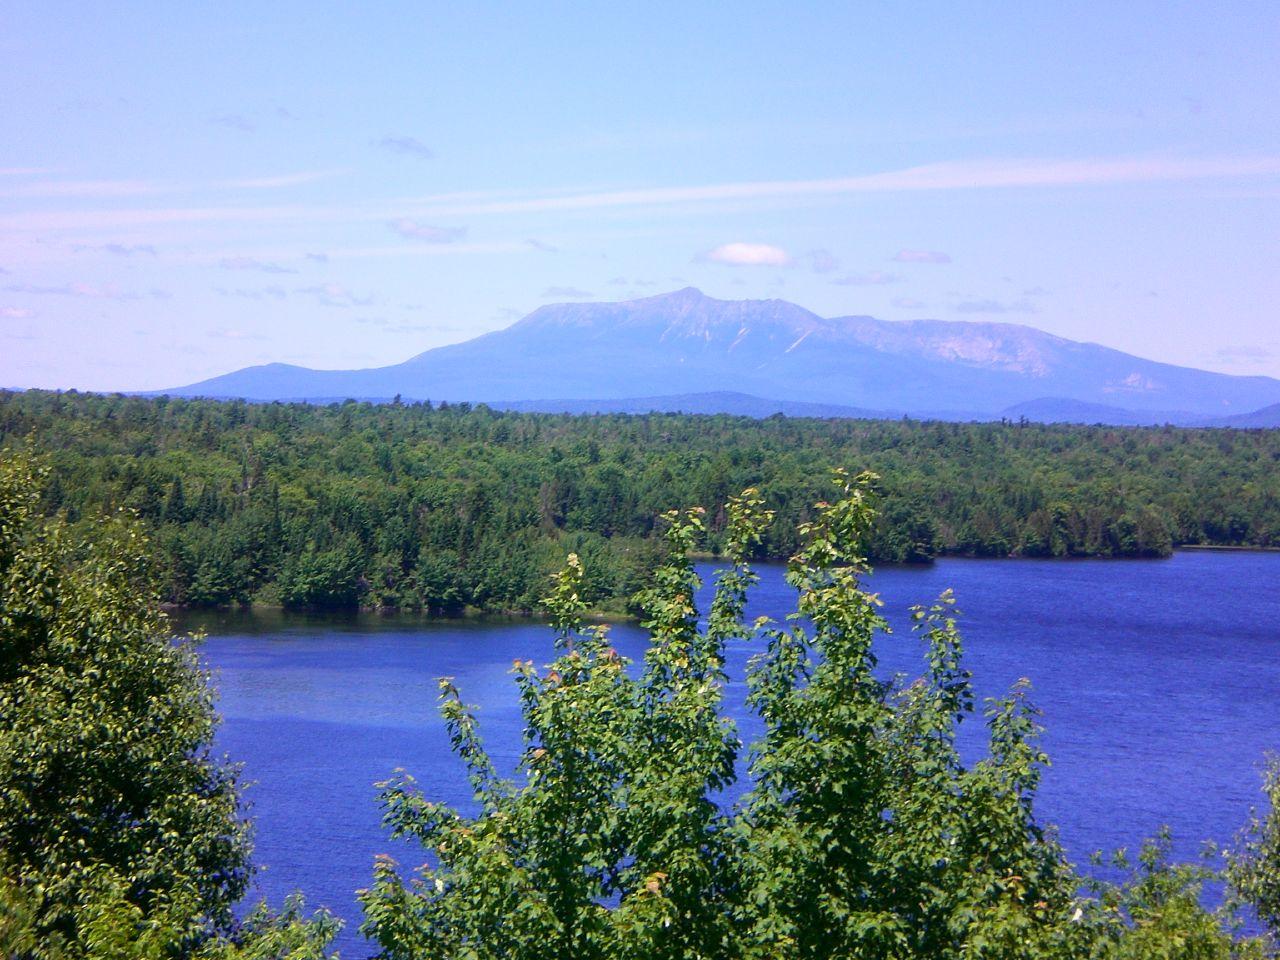 Digital Picture Image Photo JPEG Wallpaper Desktop Mountain Maine